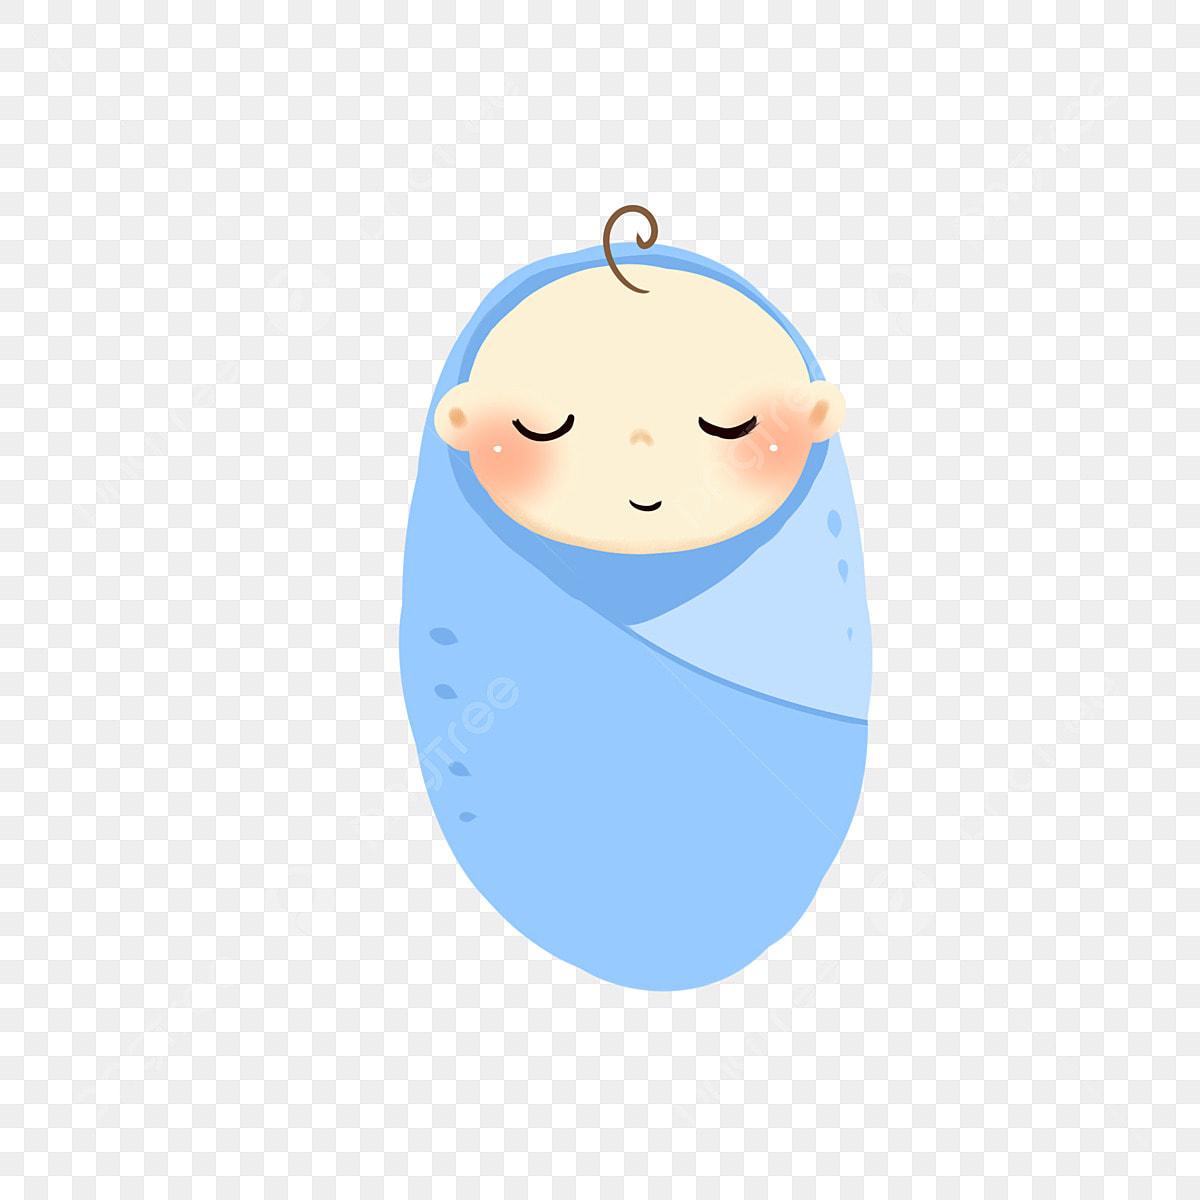 Baby Clip Art   Baby cartoon, Baby illustration, Baby clip art